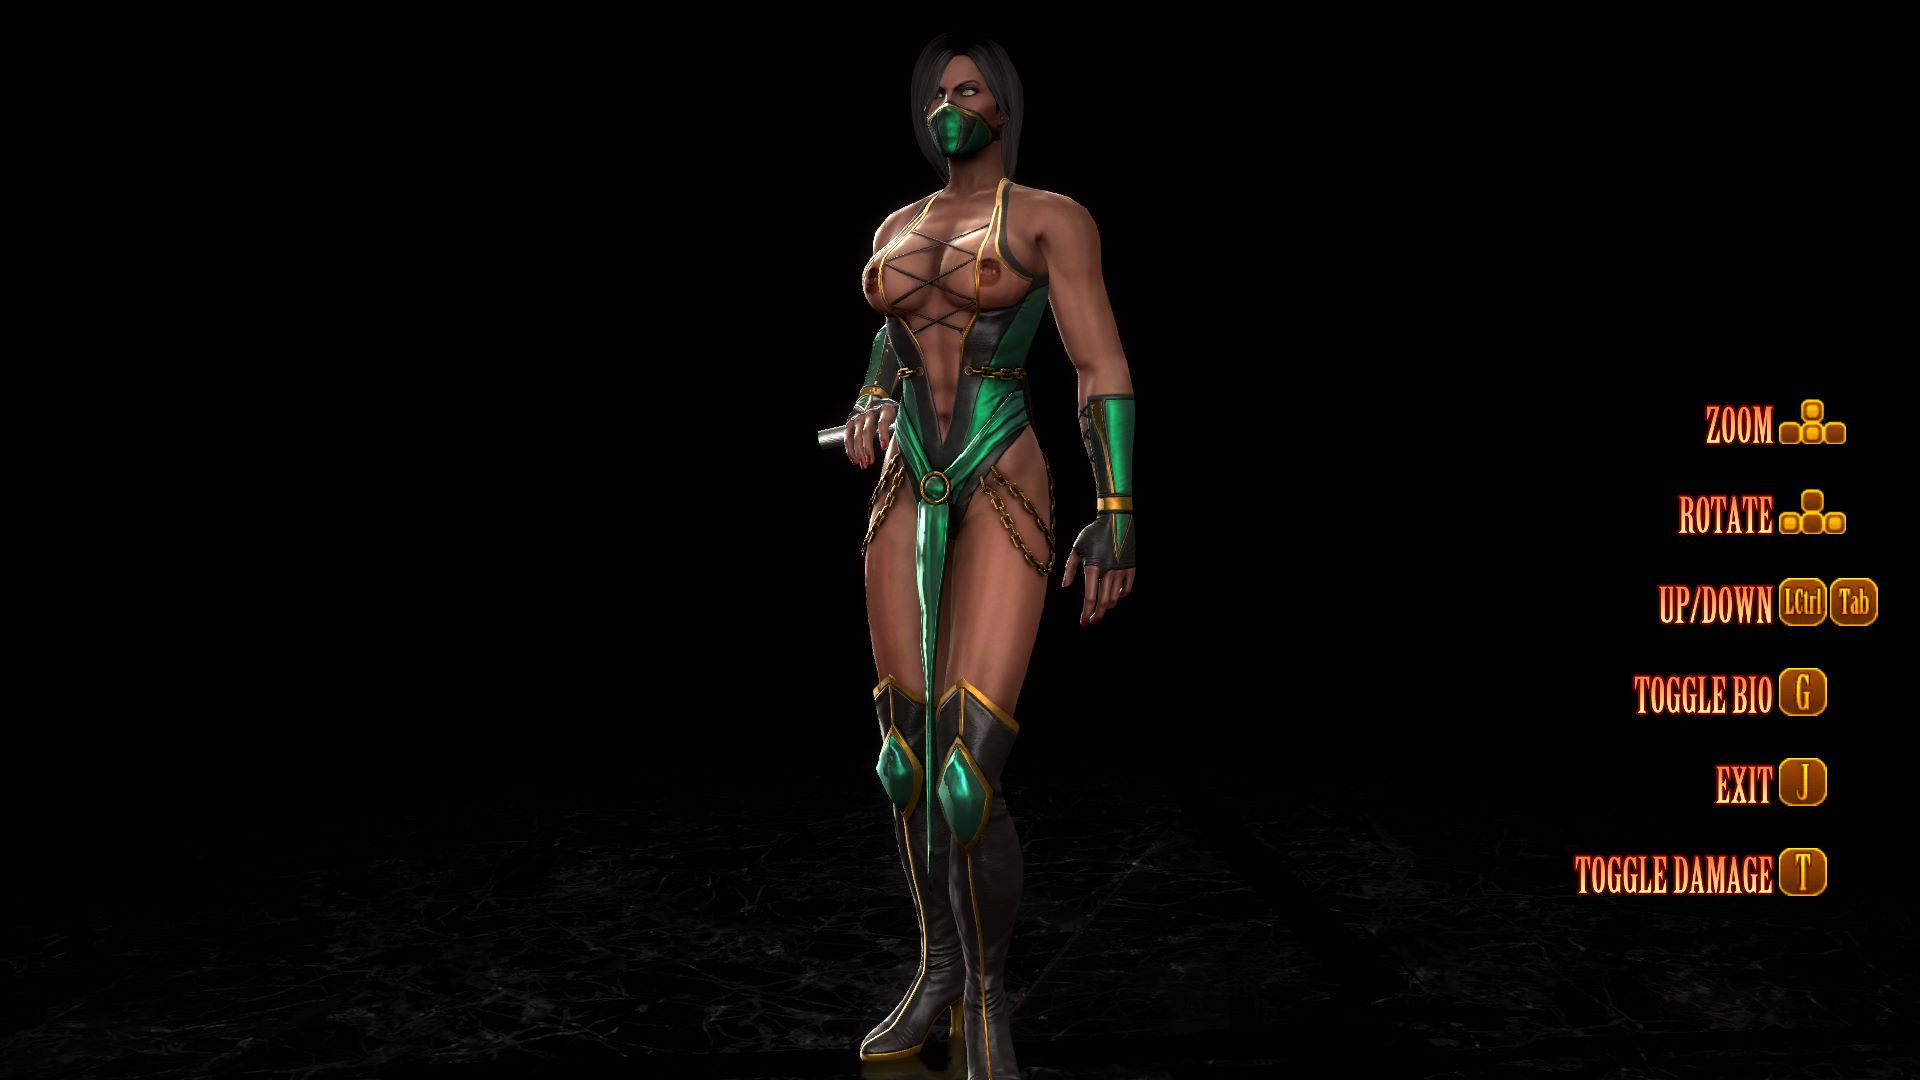 Mortal kombat 2011 nude sex images